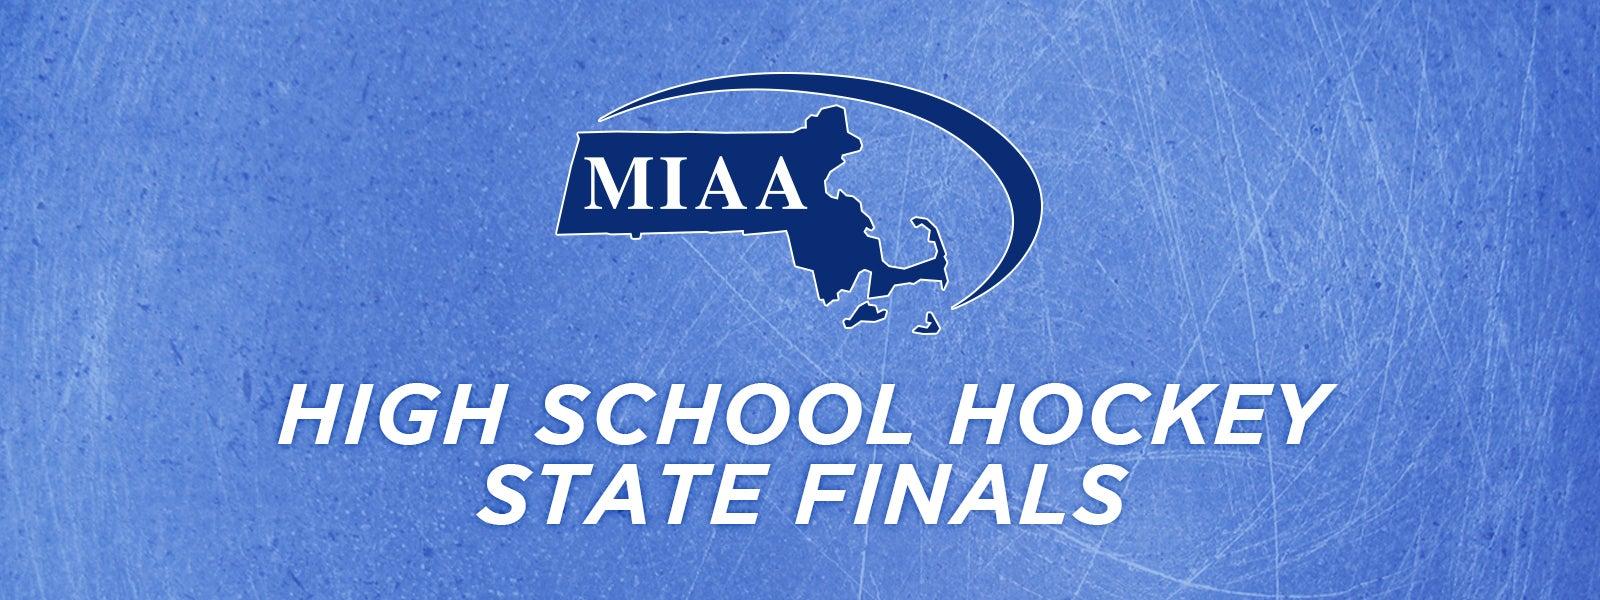 MIAA State Hockey Finals